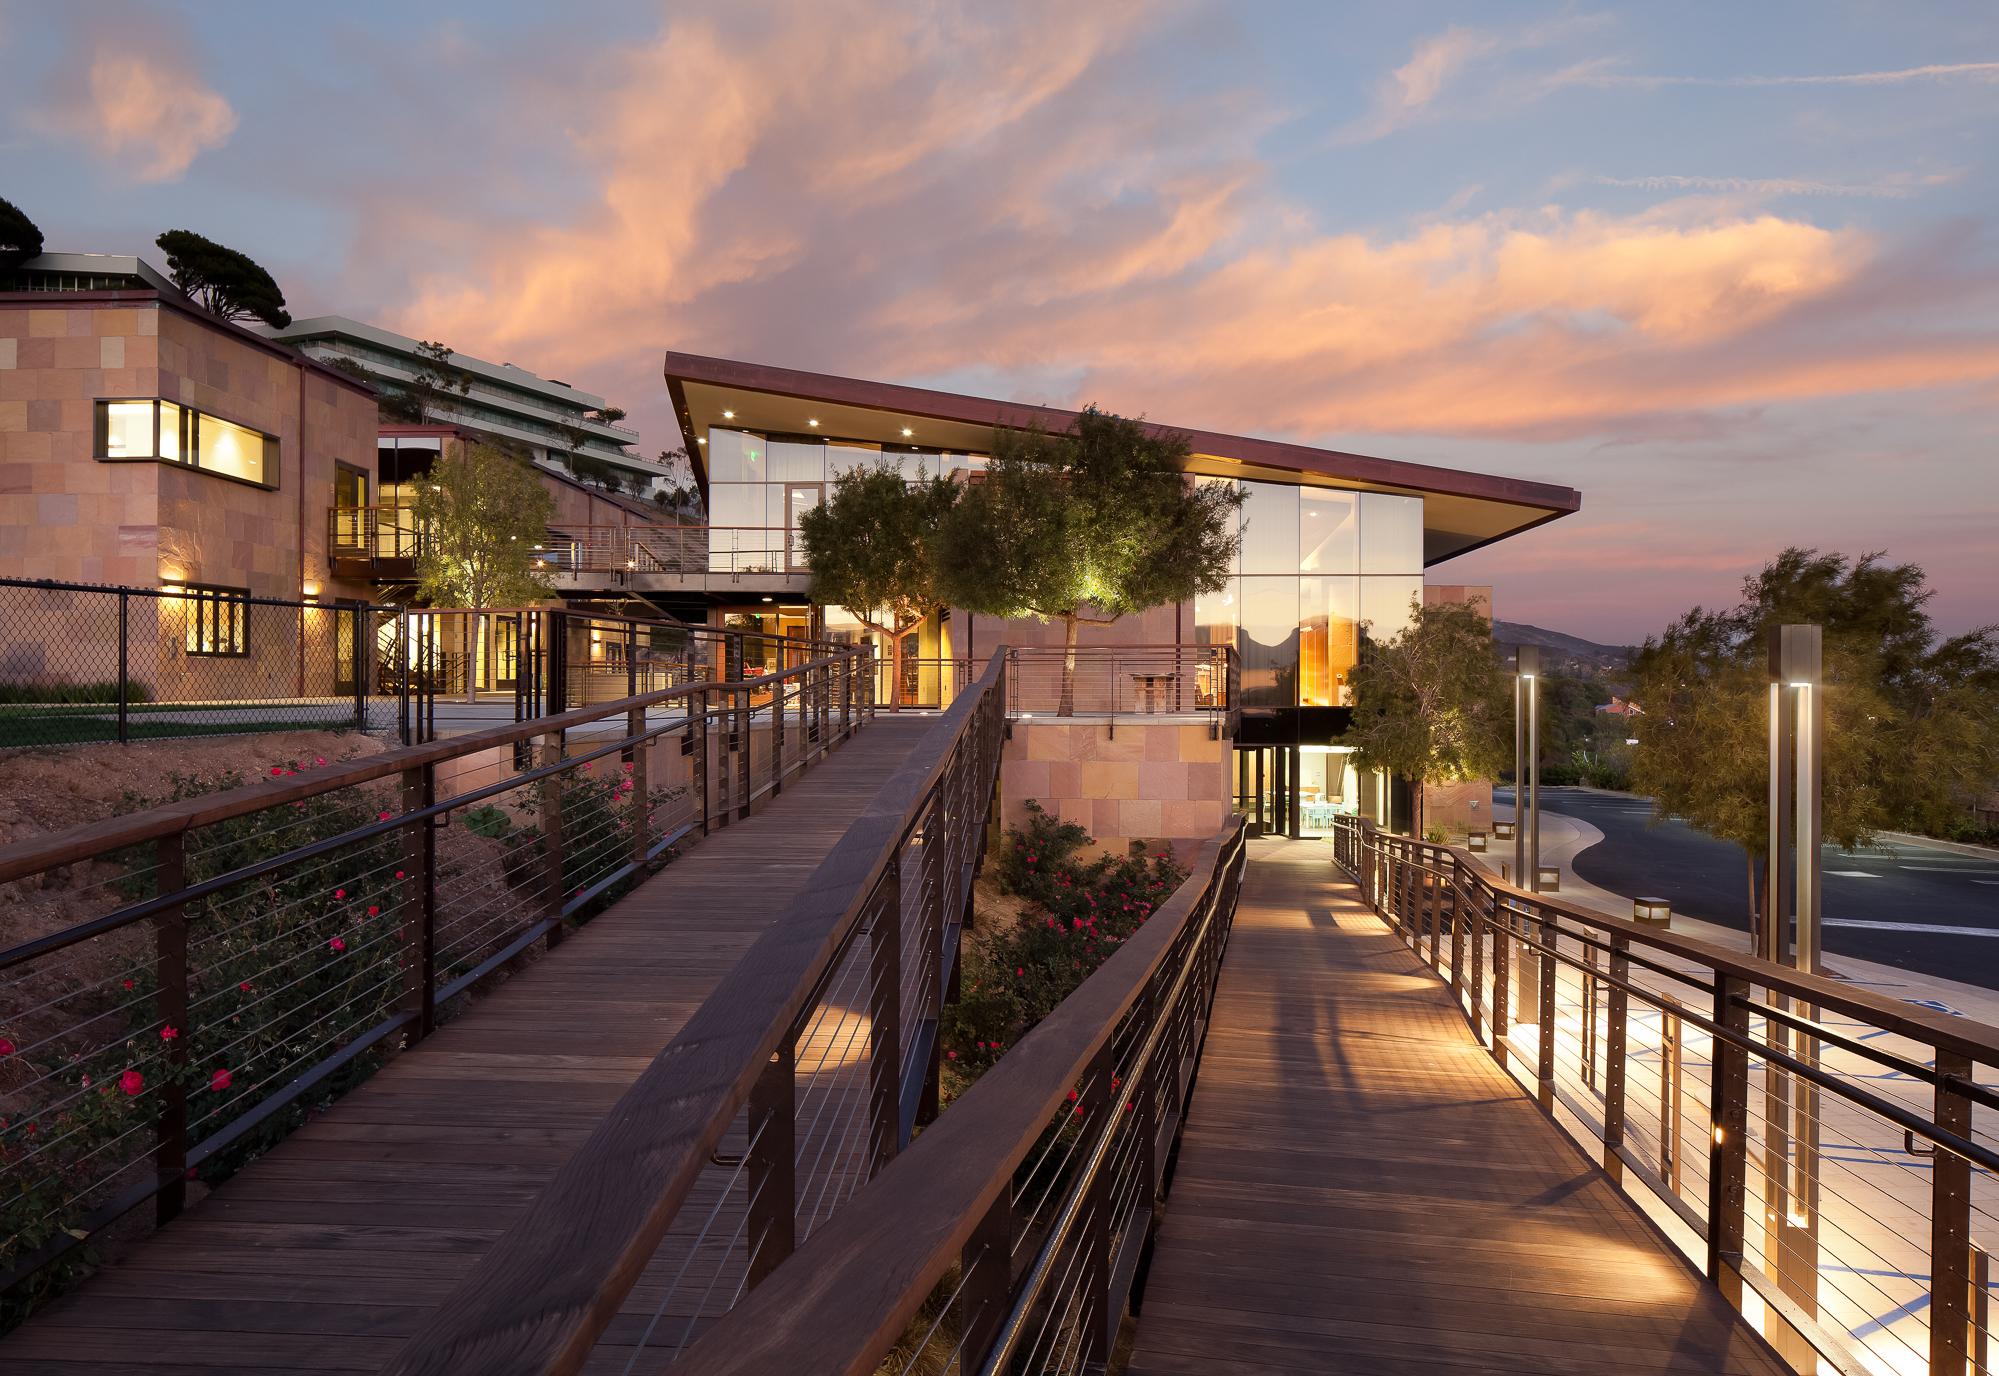 Malibu-Presbyterian-Church-Architecture-domusstudio